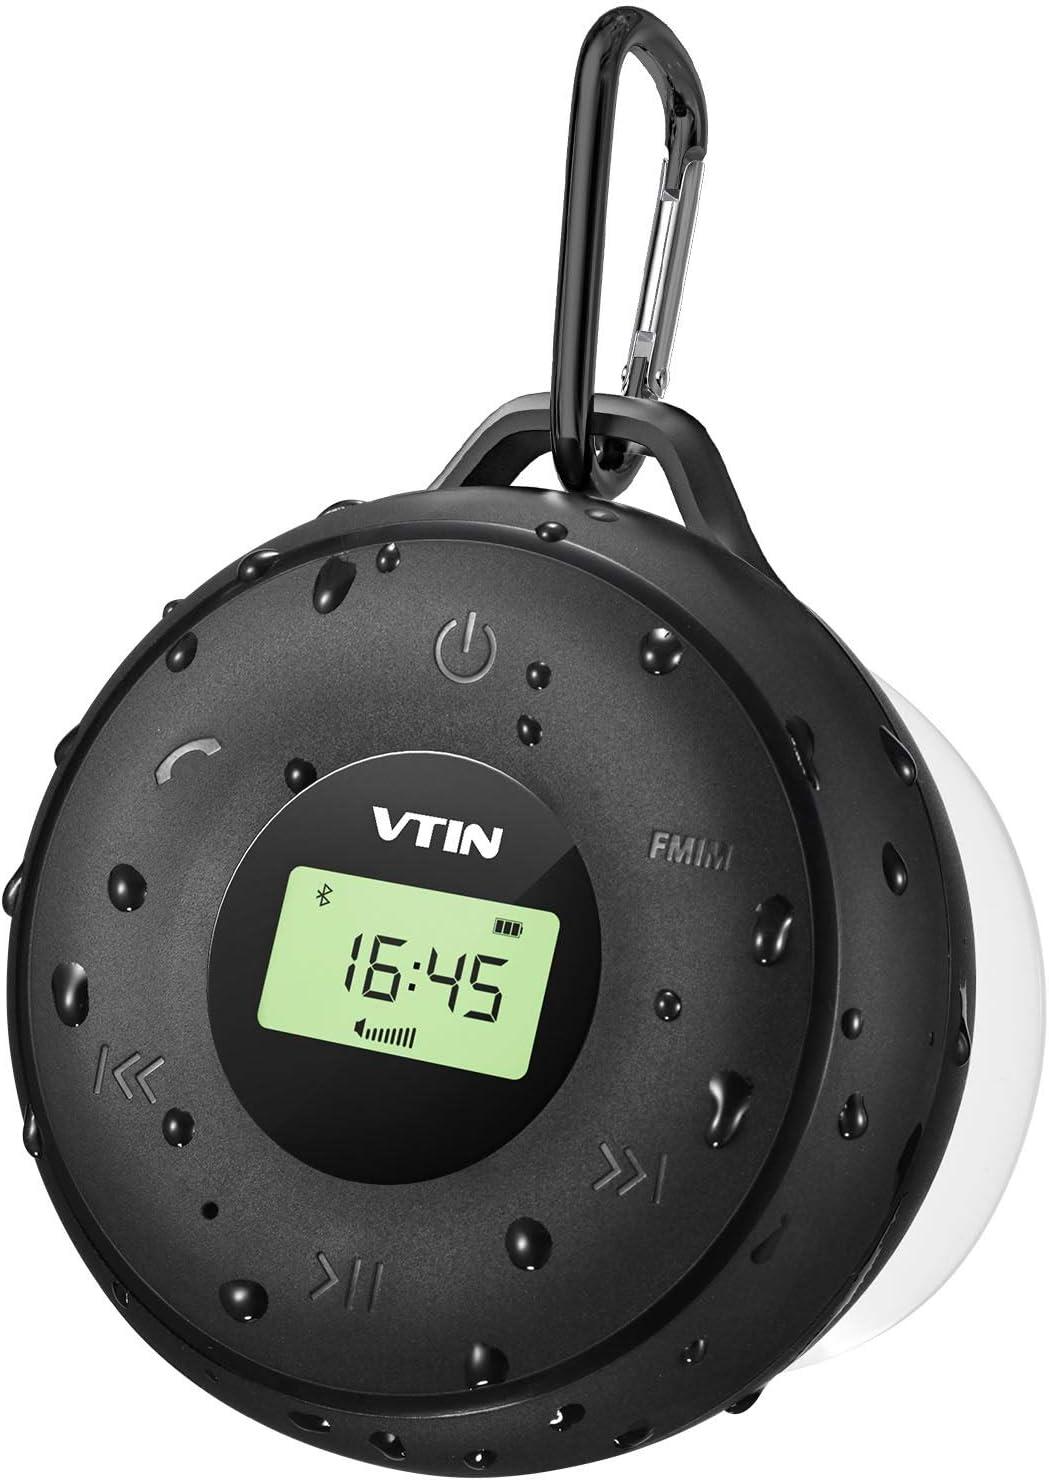 VTIN R4 Altavoz Bluetooth 20W, Altavoz Portatil Bluetooth 5.0, 30H de Reproducción, Altavoz Exterior con Micrófono, AUX/TF, para Móvil, Tabletas, MP3, Fiestas, Viajes